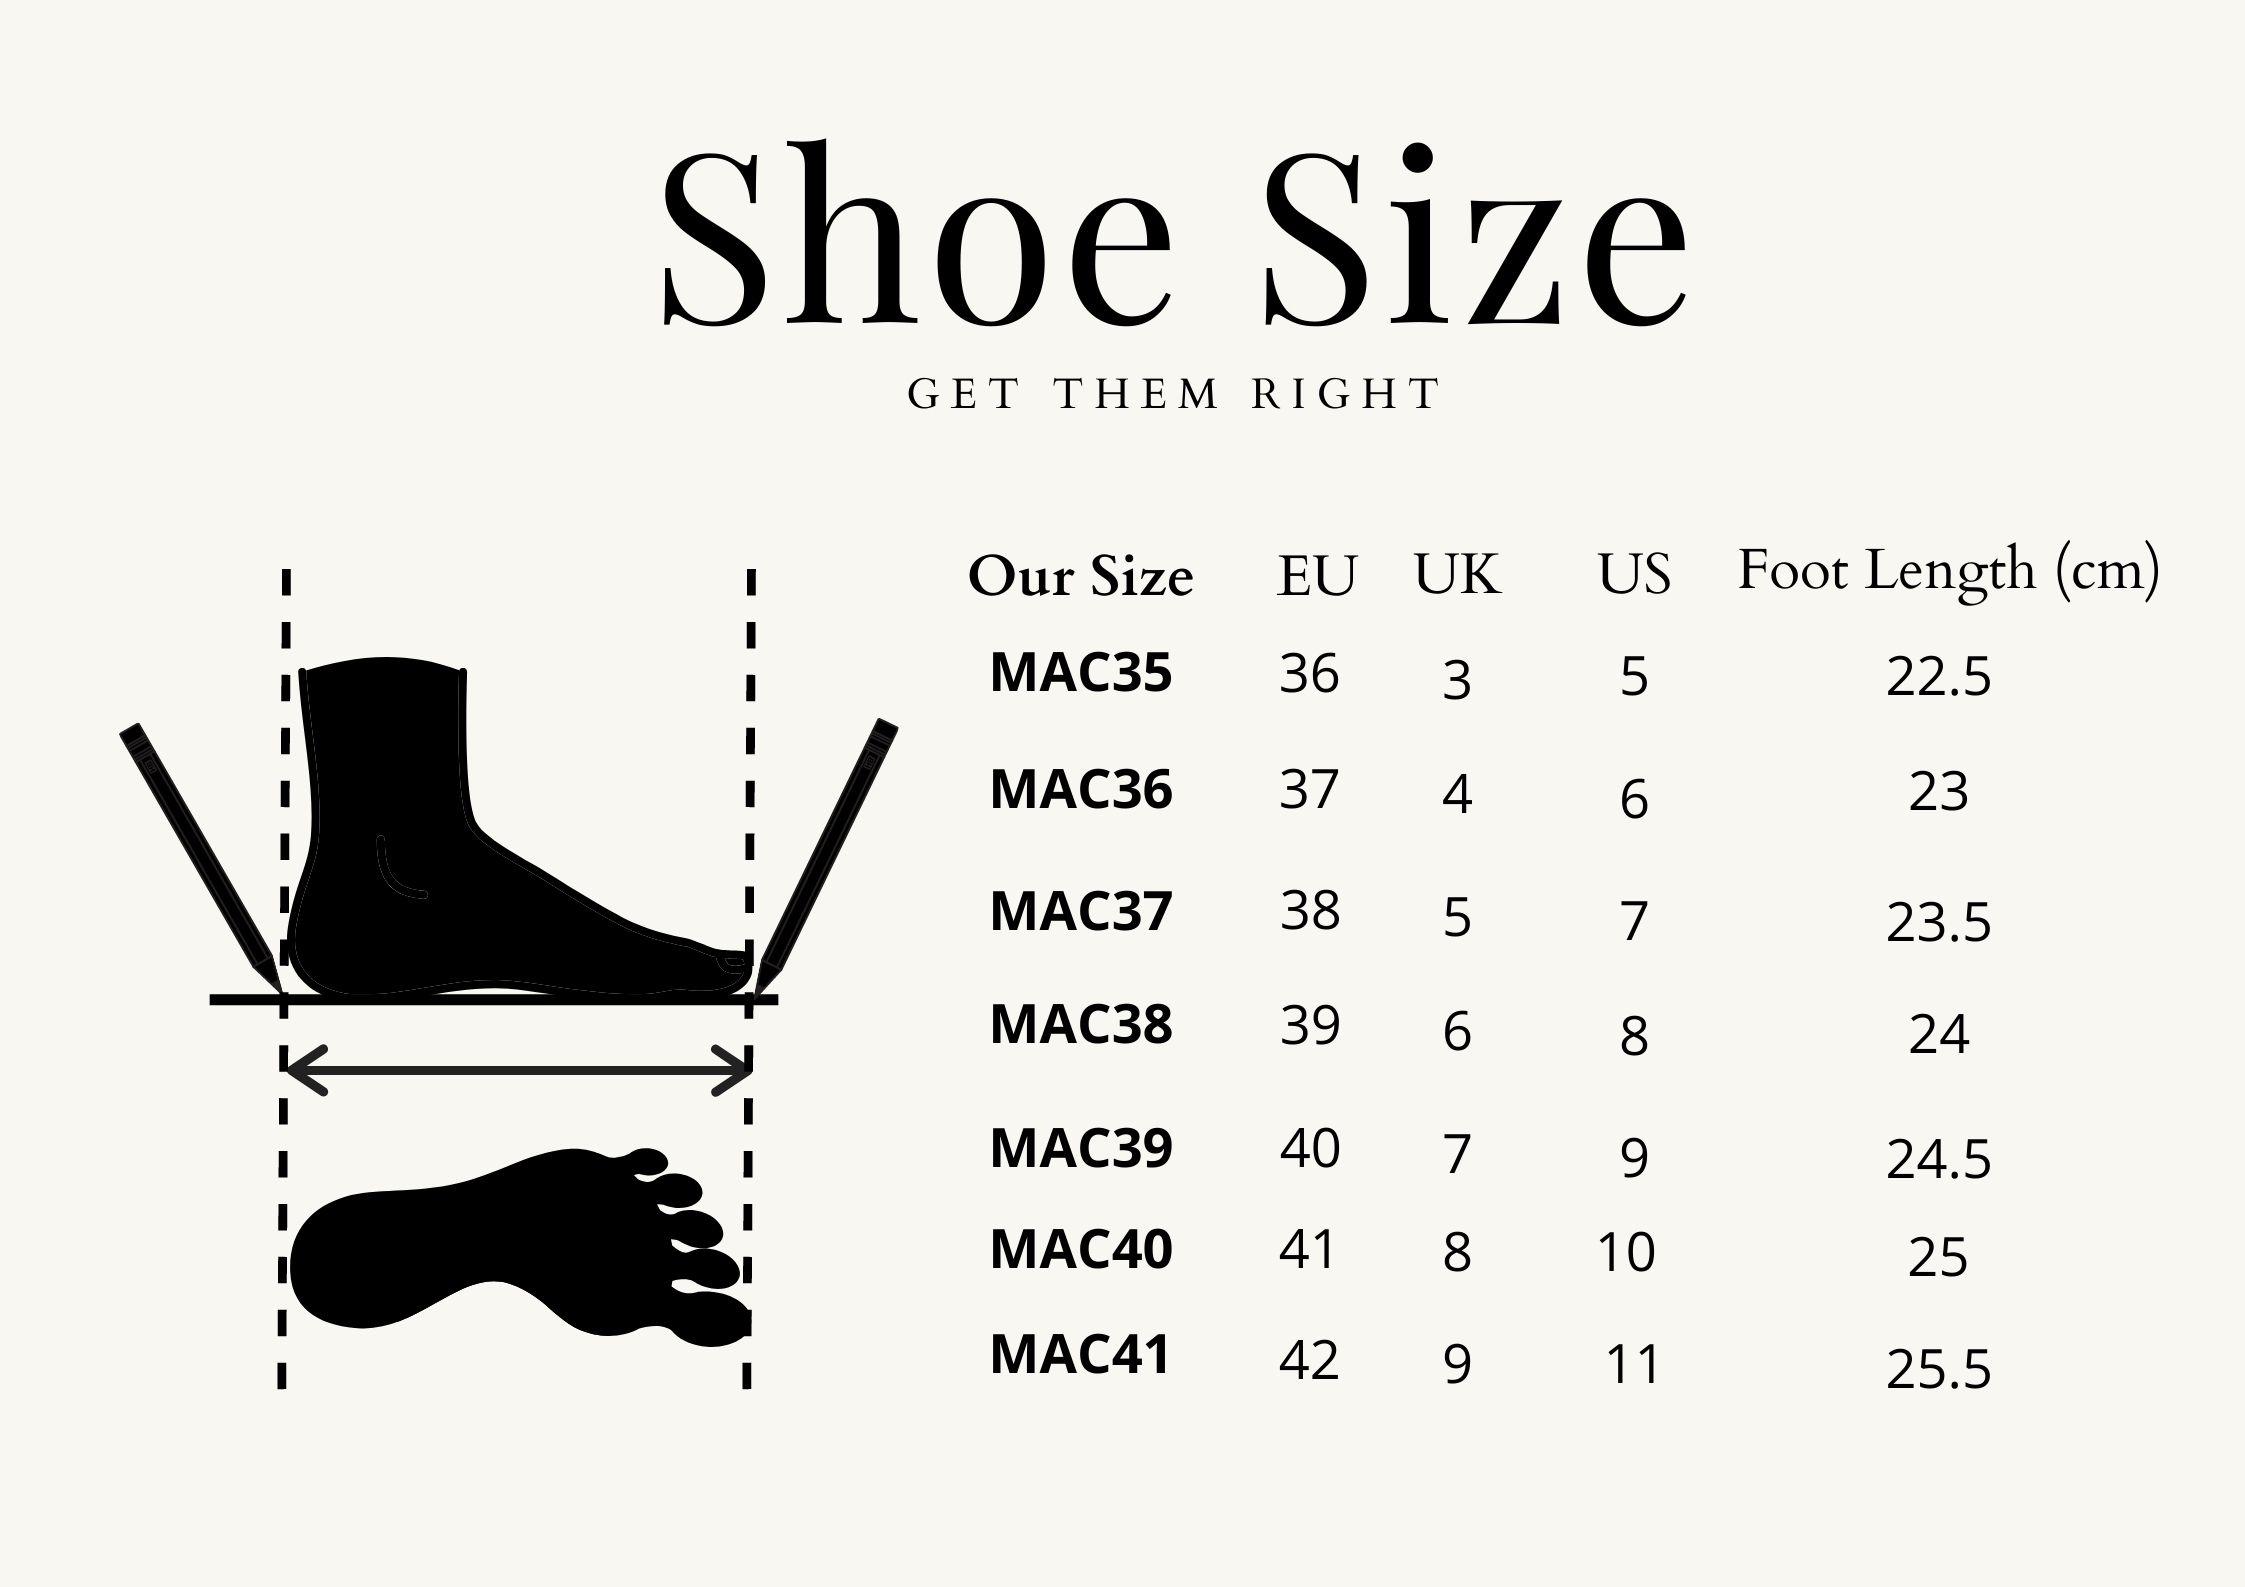 EUR Size US Size UK Size Foot Length (cm) 35 4 2 20.8 36 5 3 21.6 37 6 4 22.4 38 7 5 23.3 39 8 6 24.1 40 9 7 25 41 10 8 25.8 42 11 9 26.6.png